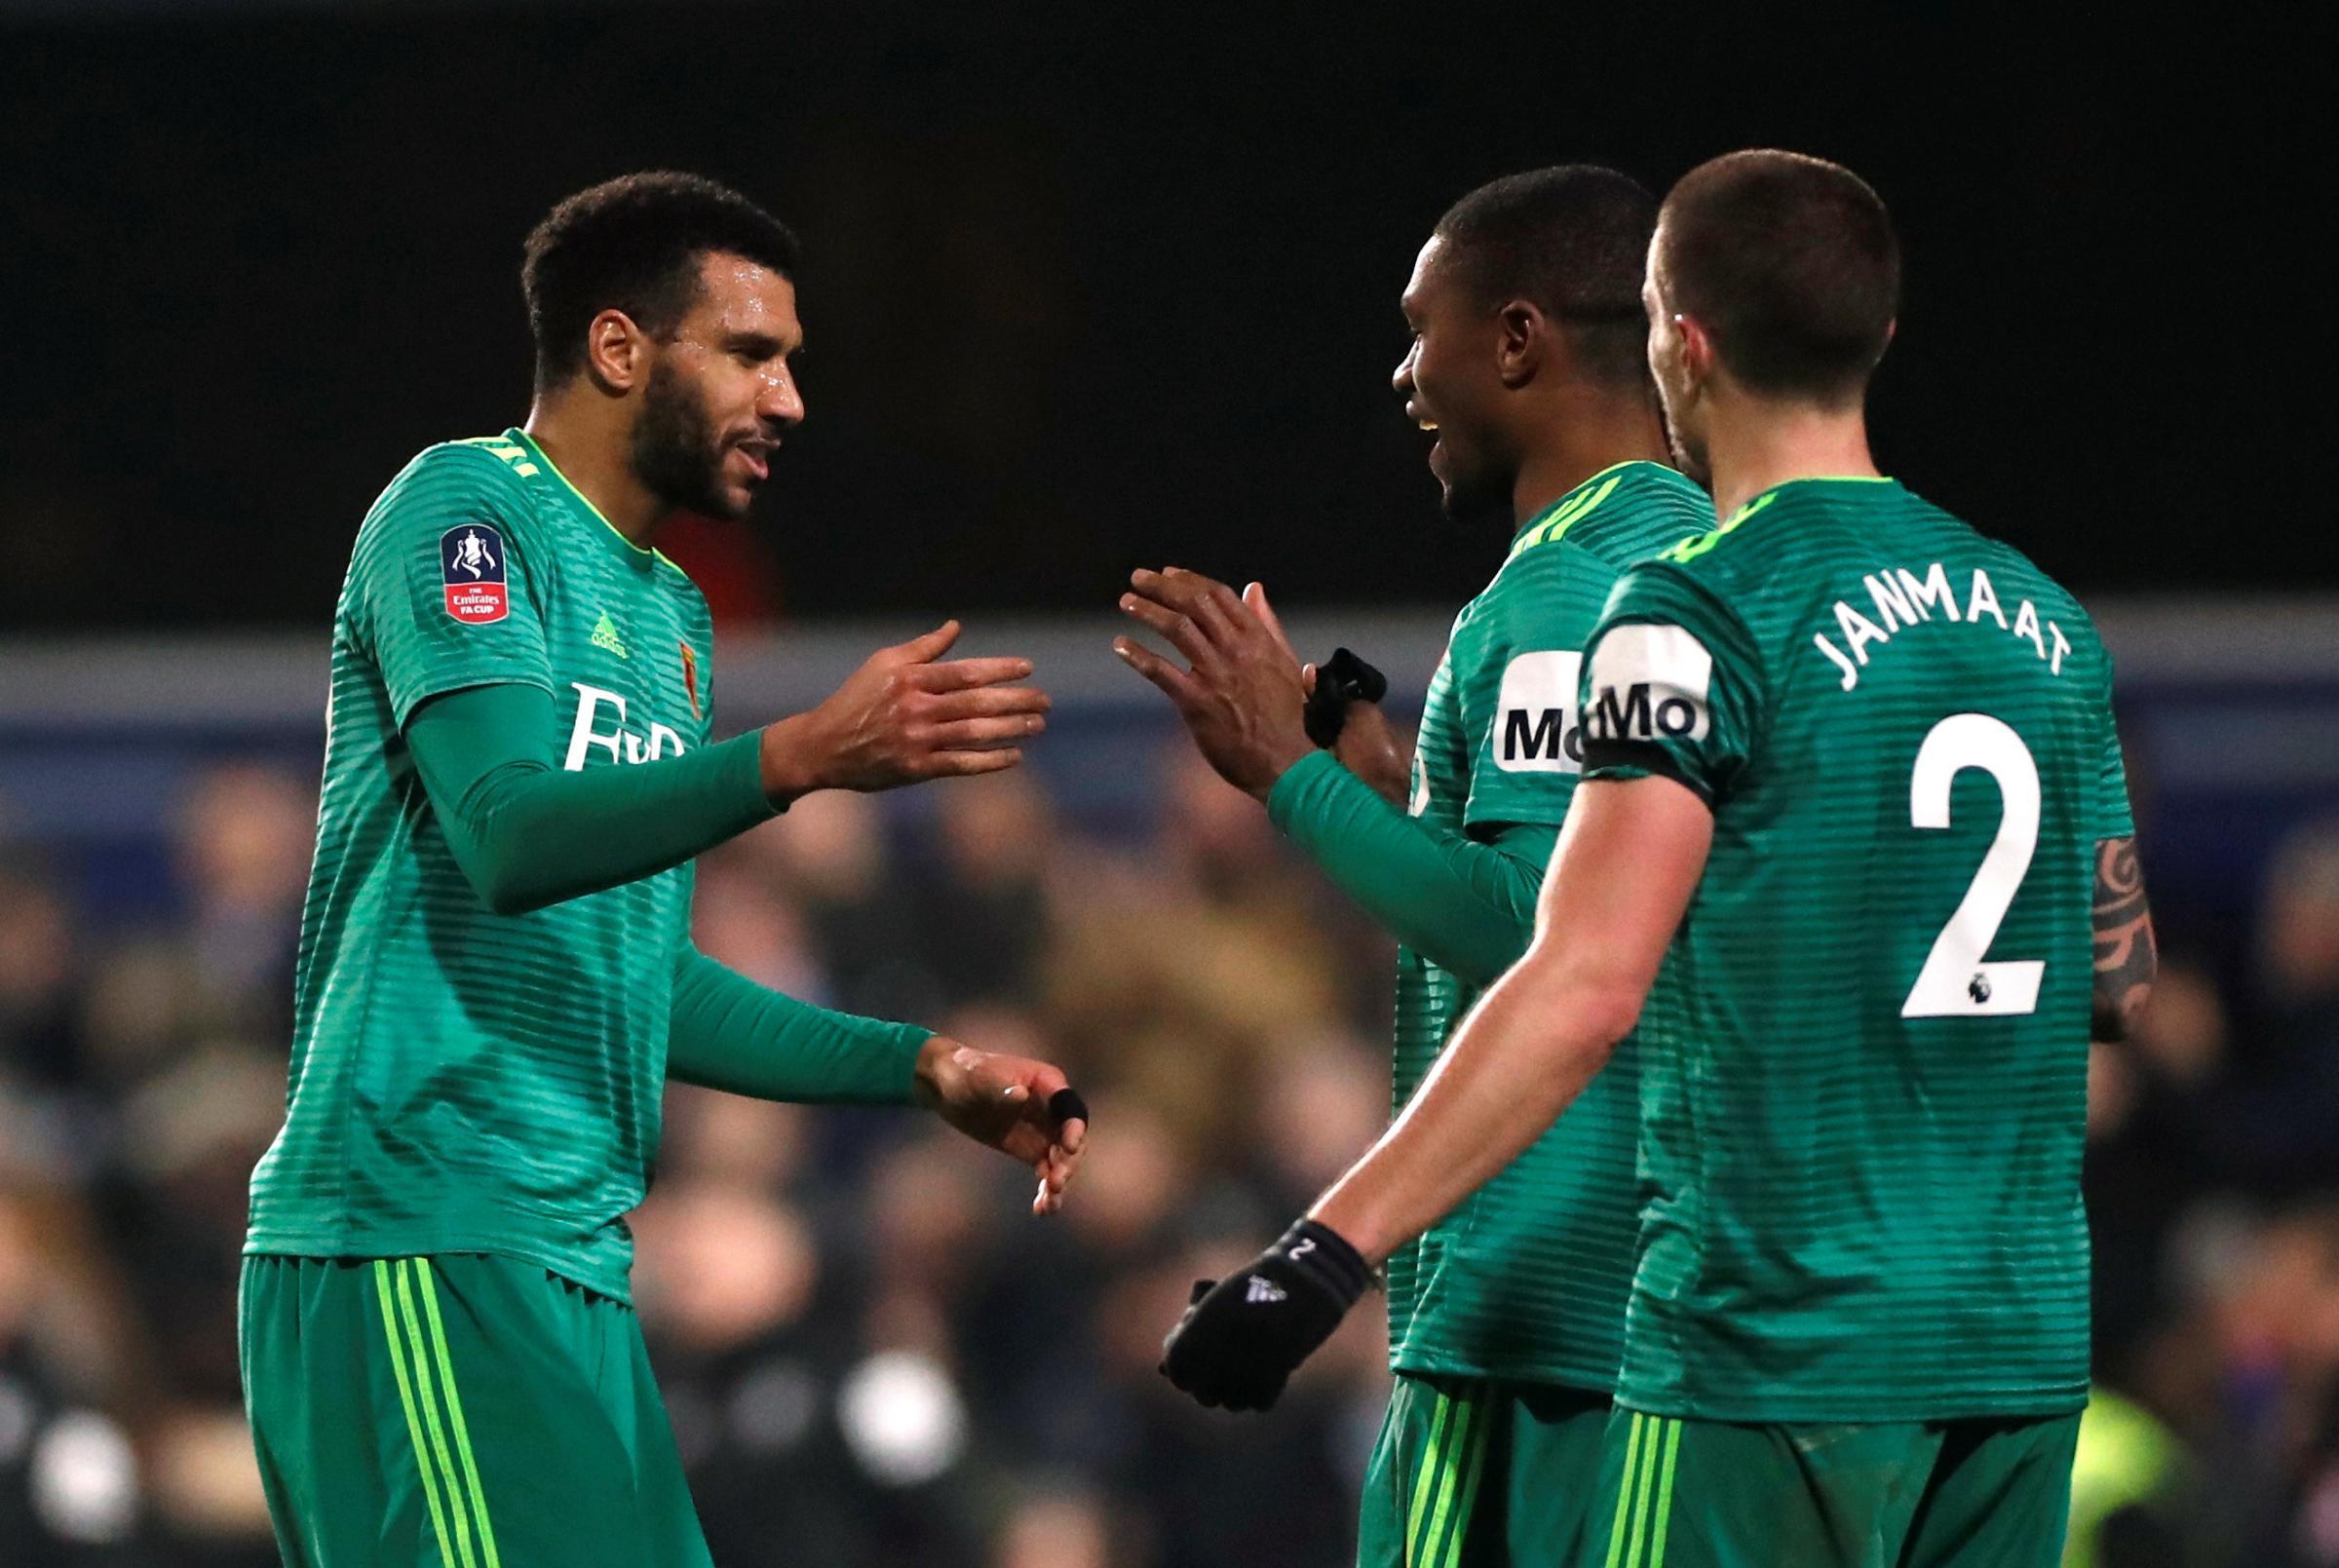 FA Cup quarter-final draw info